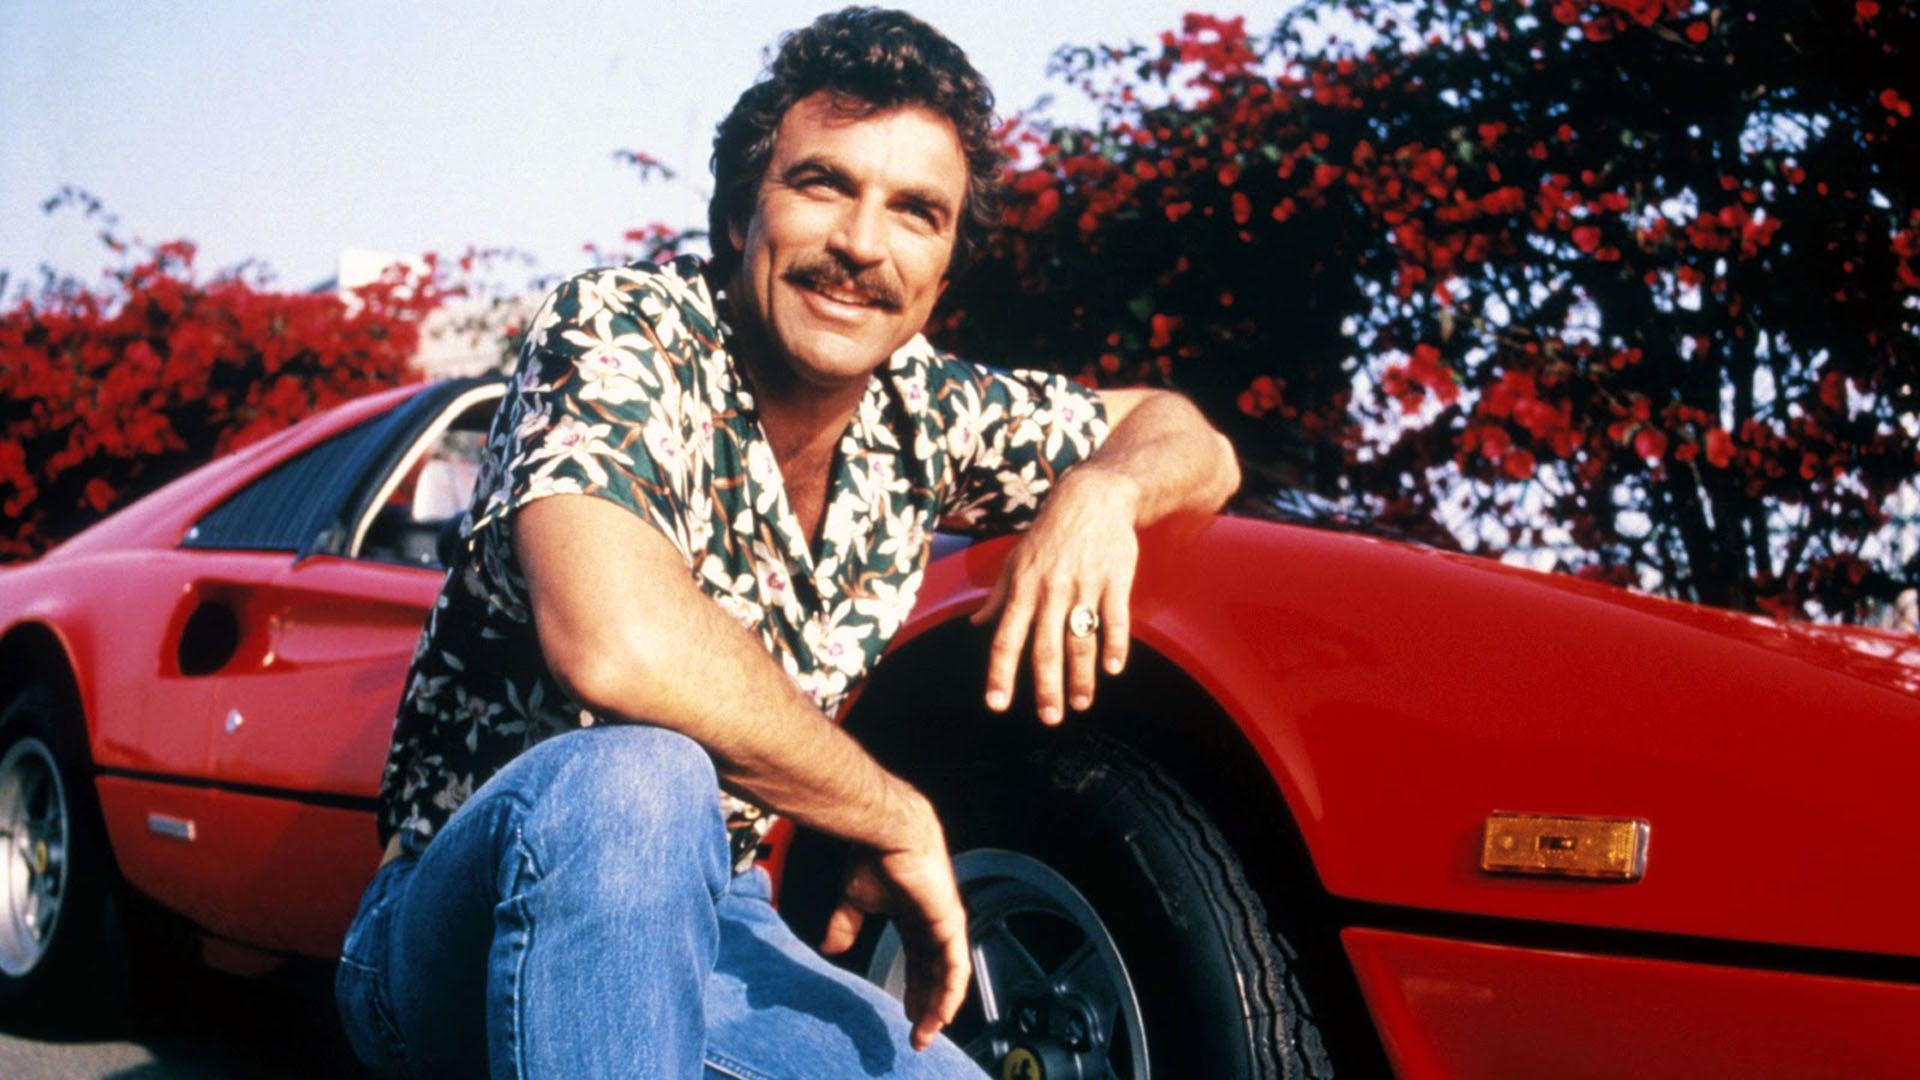 Tom Selleck som Magnum P.I.. Hawaiiskjorta ... b4c32a9dbc5ae